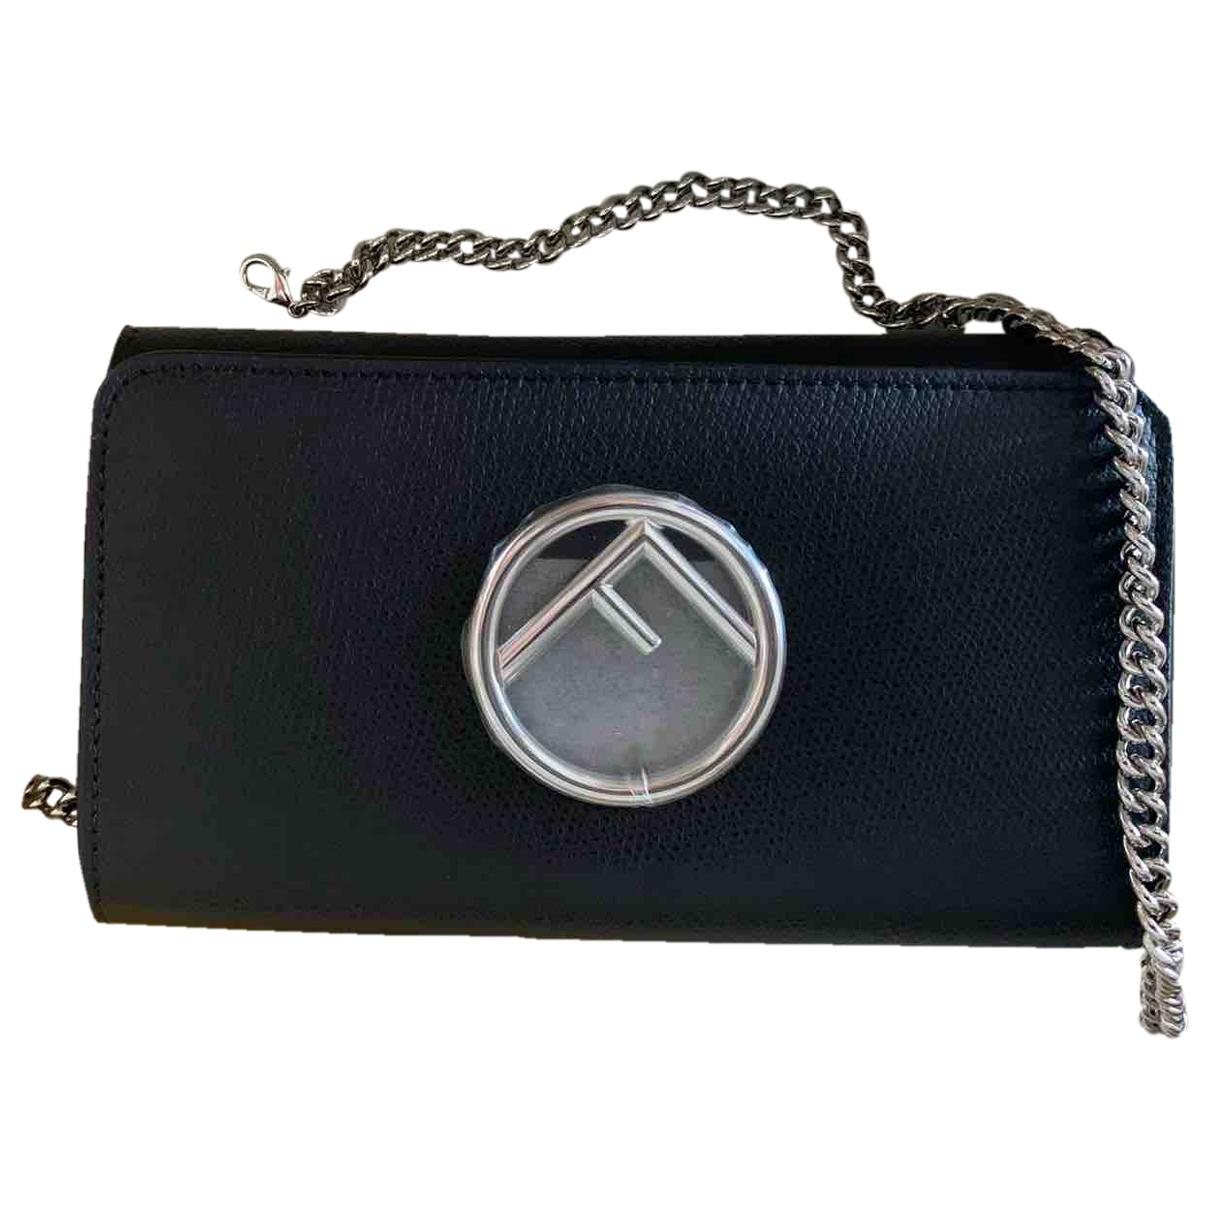 Fendi Kan I logo Black Leather Clutch bag for Women \N